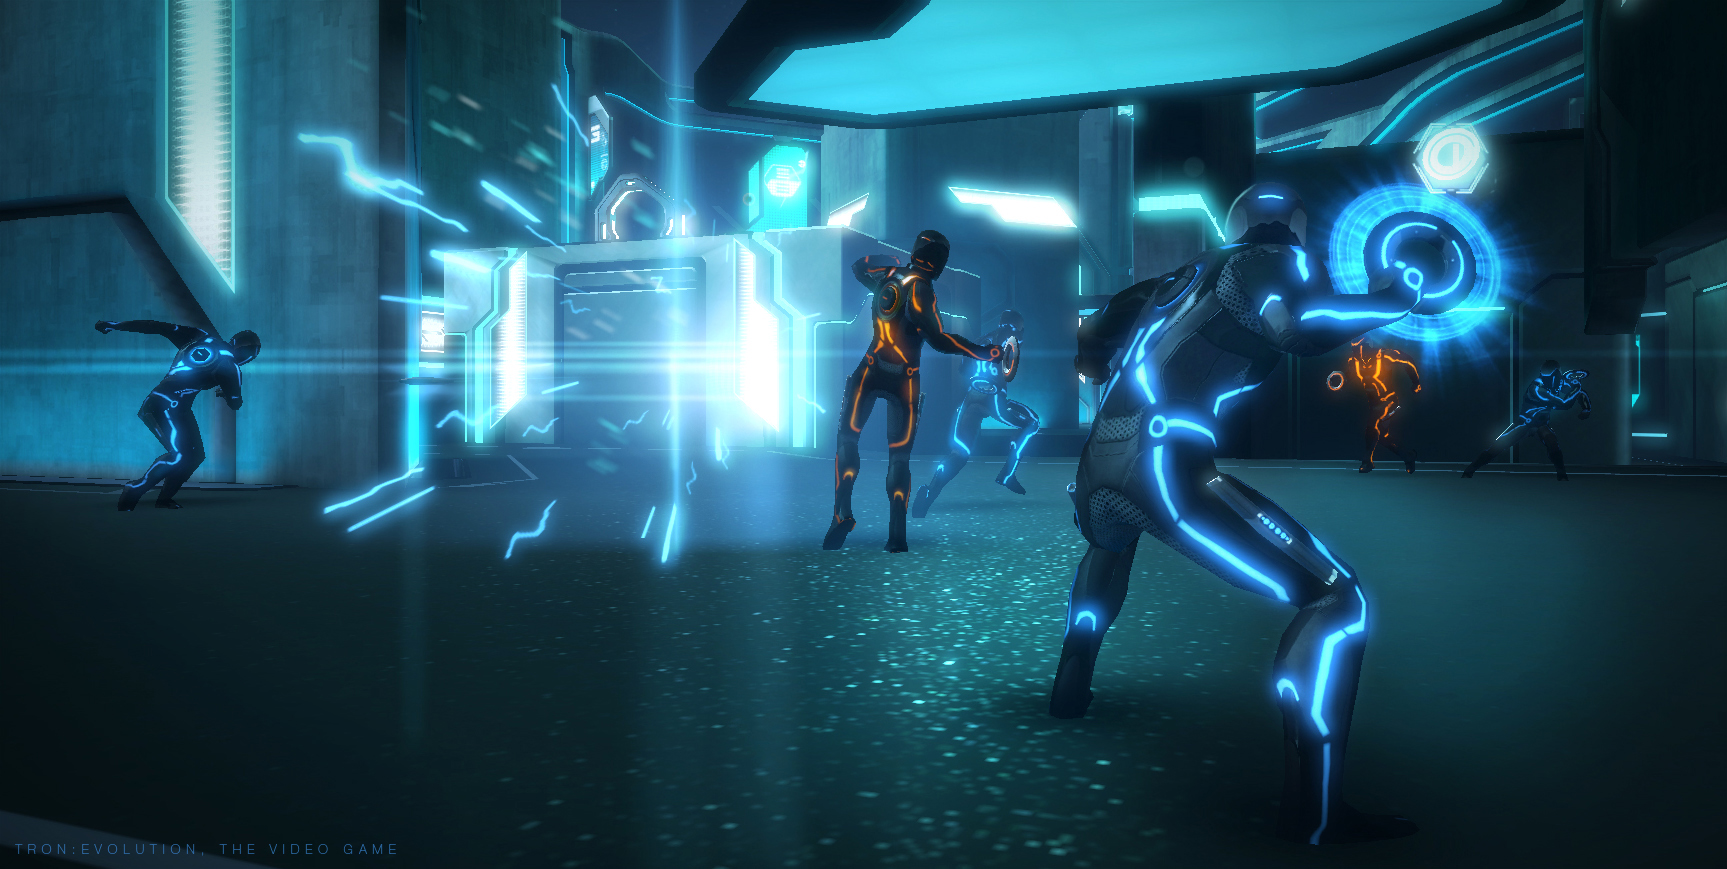 Galerie: V Tron: Evolution bojujeme proti virům 20521